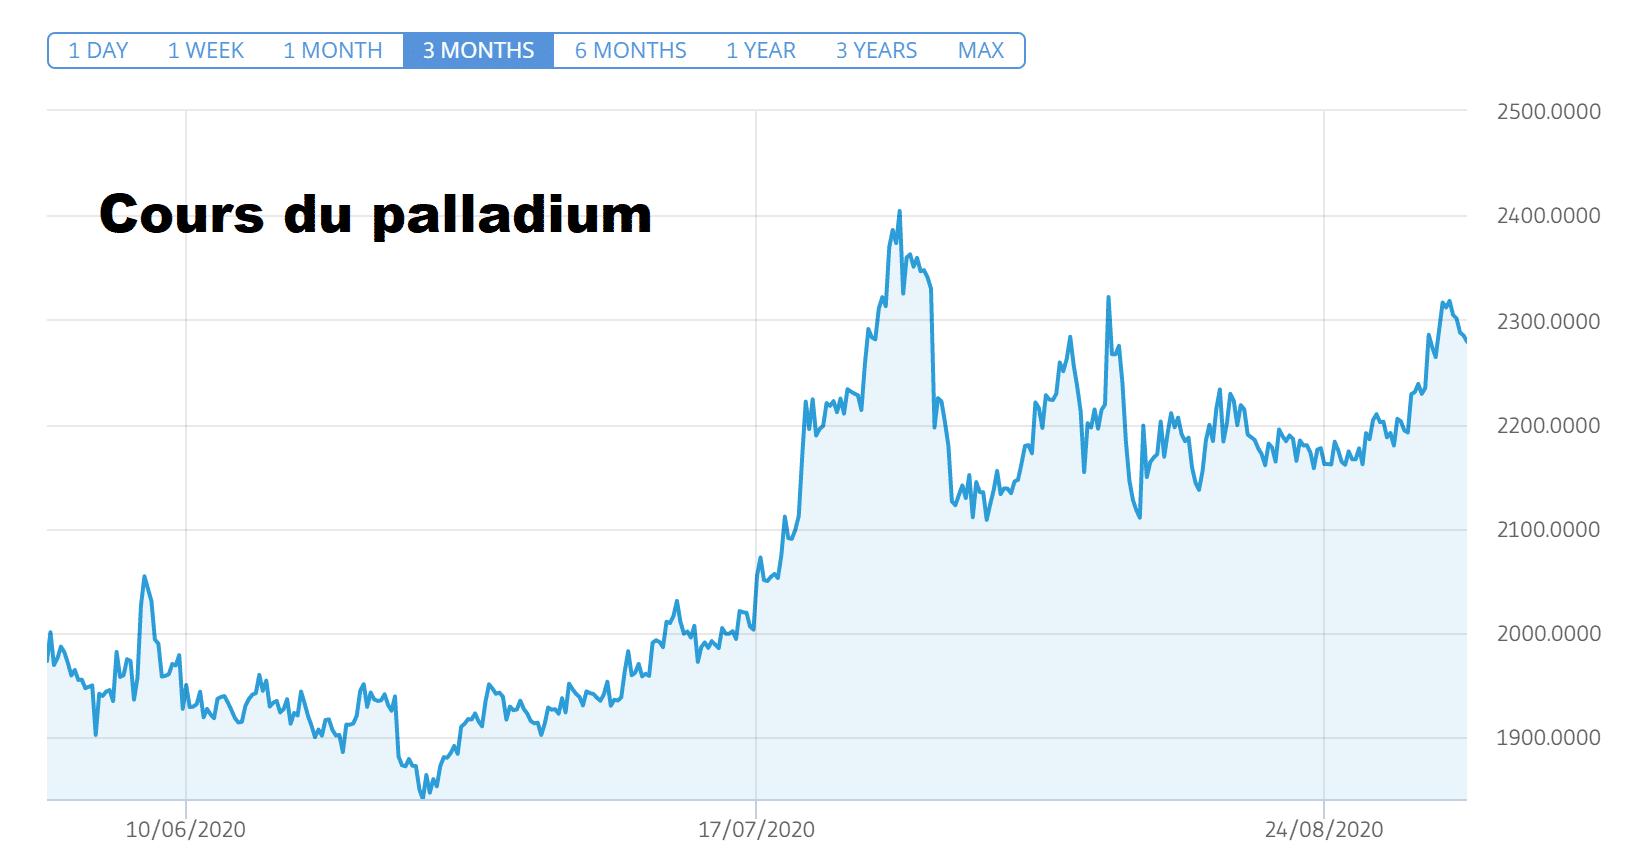 cours platine palladium explose or record surplace feu